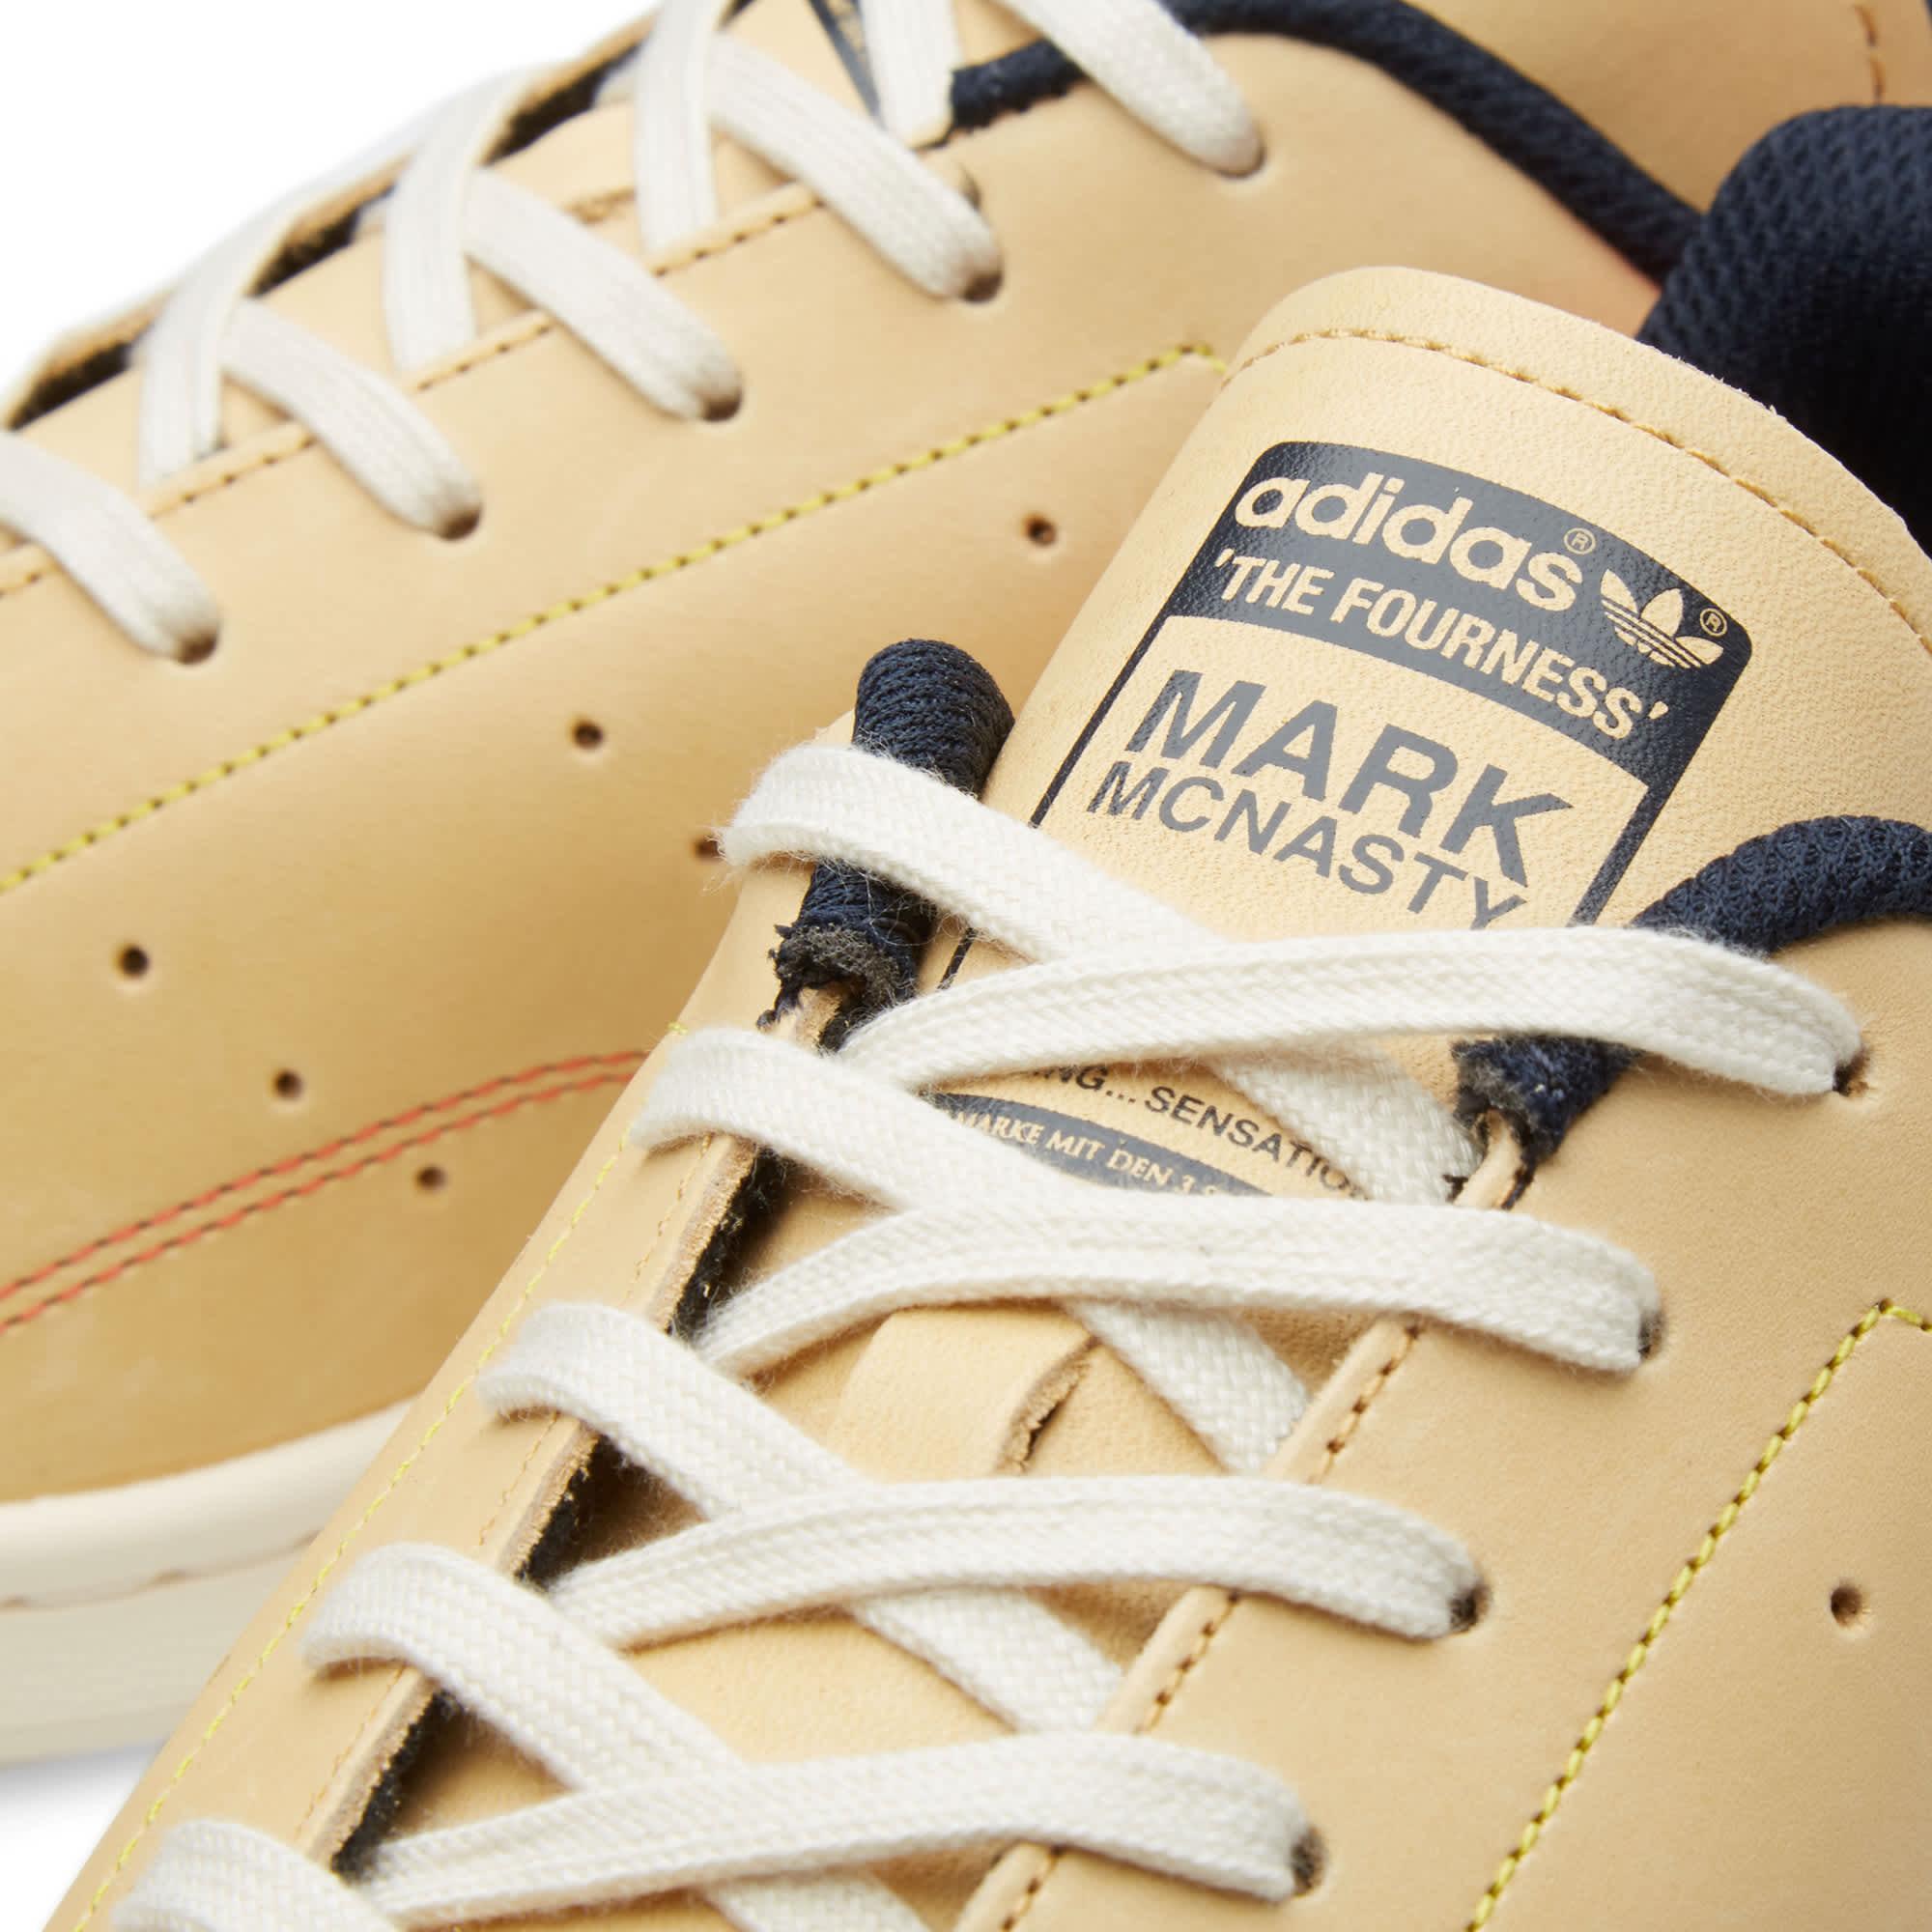 Adidas x The Fourness x Mark McNairy Stan Smith - Pale Nude & Chalk White